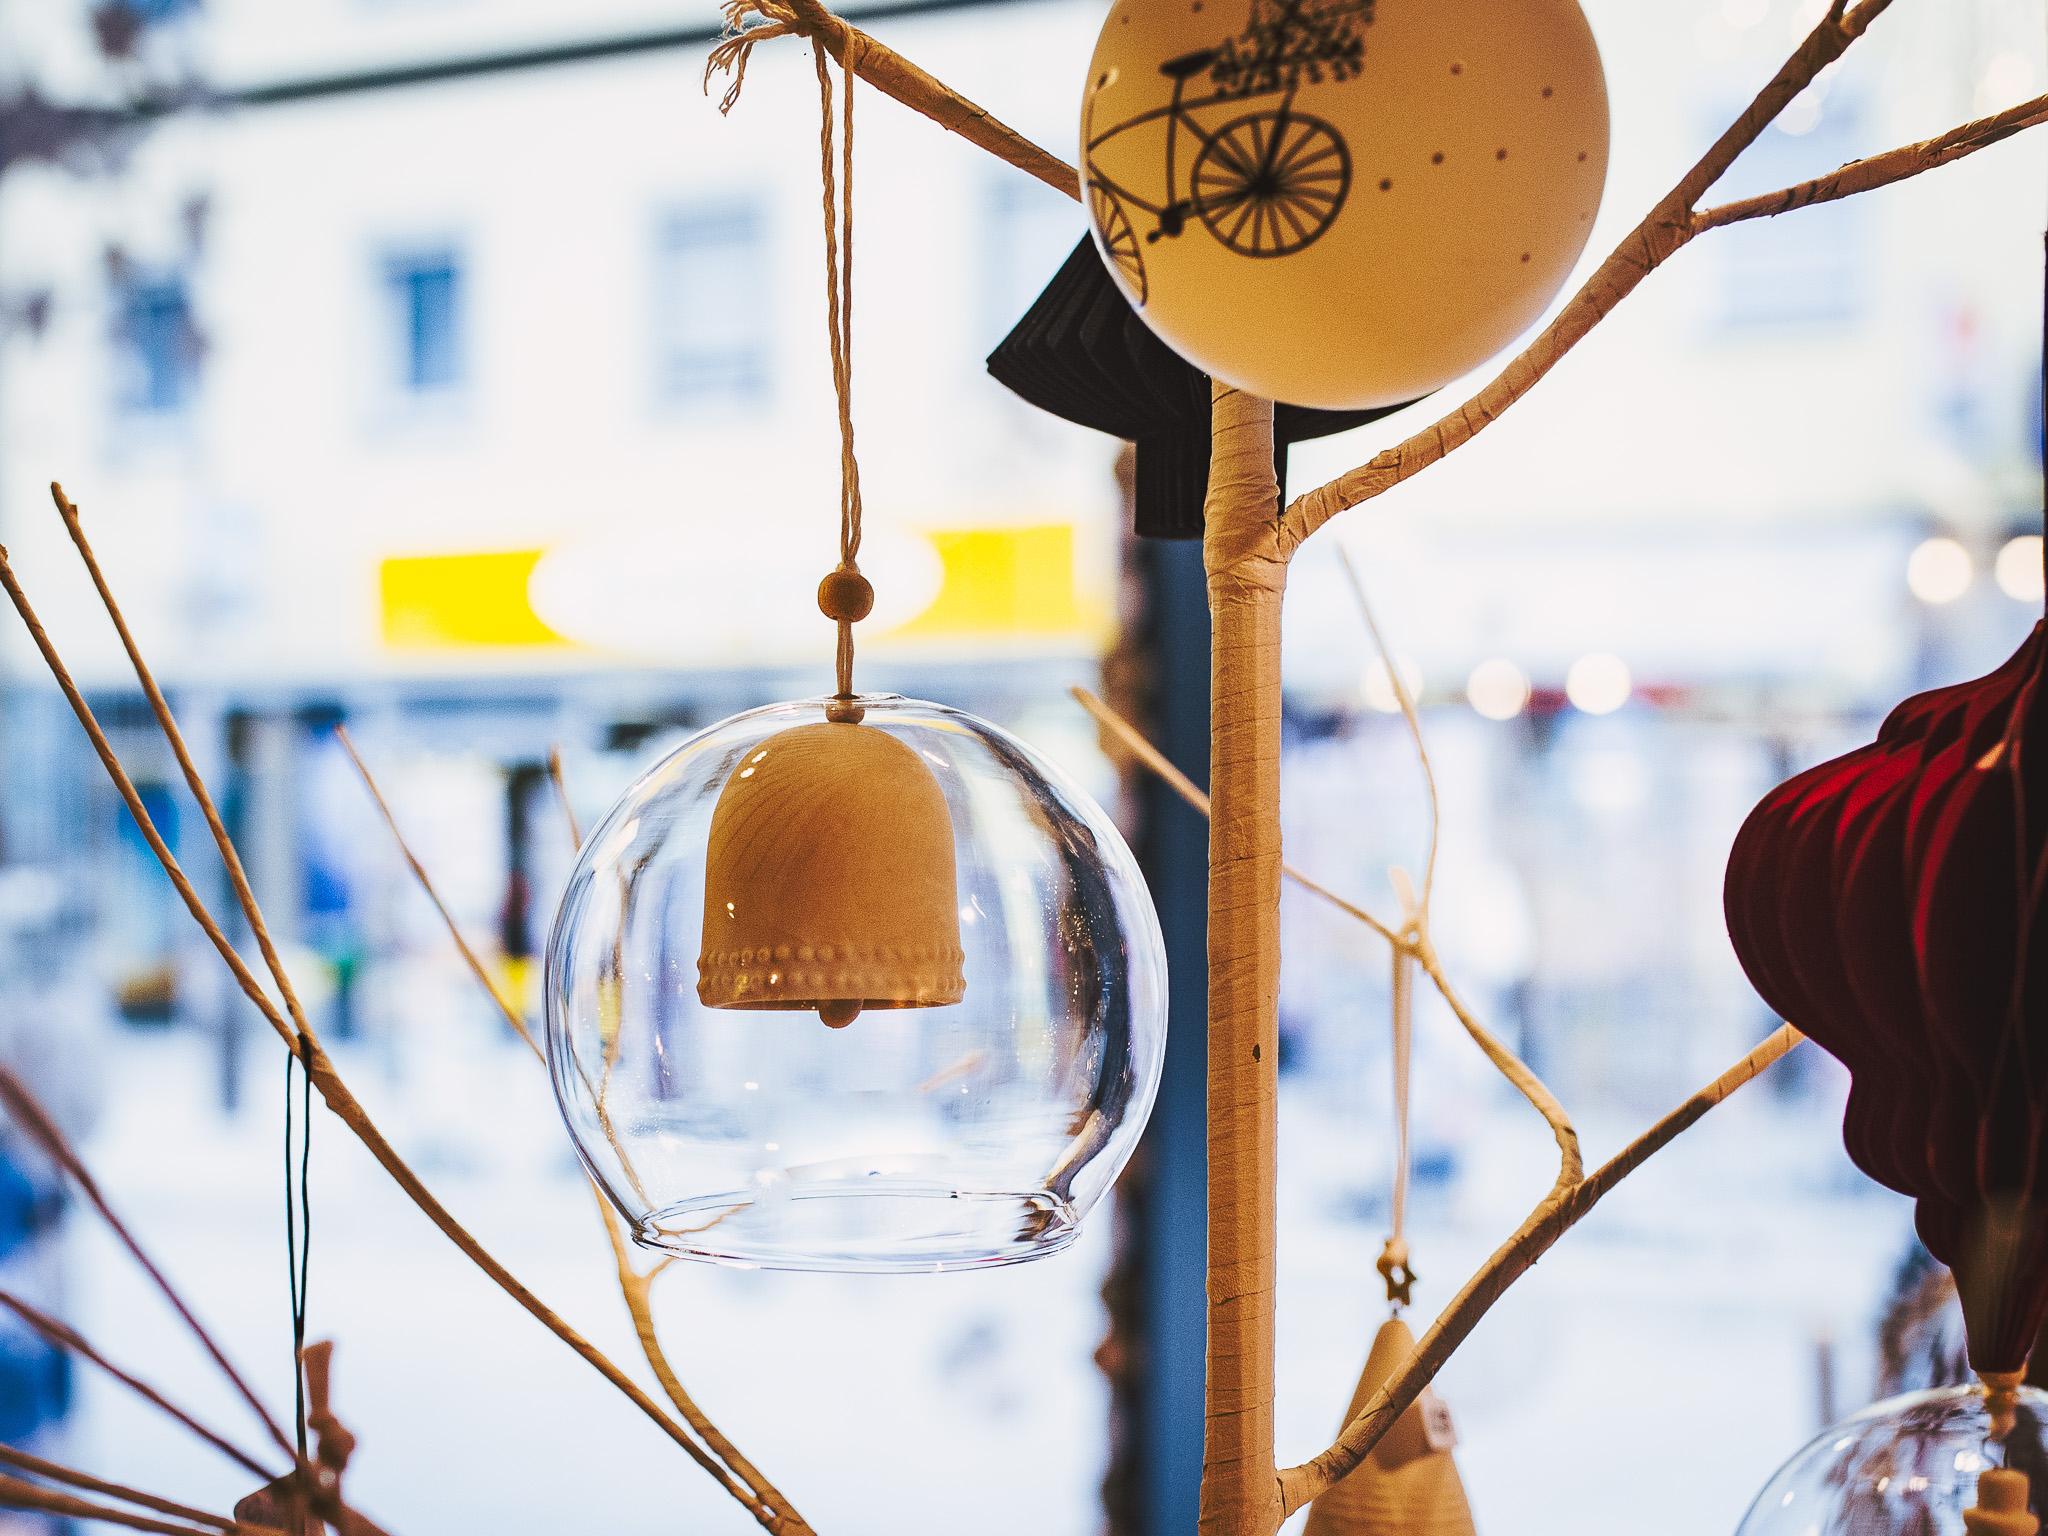 Besondere Glaskugel mit Tonglocke. Foto: Pascal Höfig